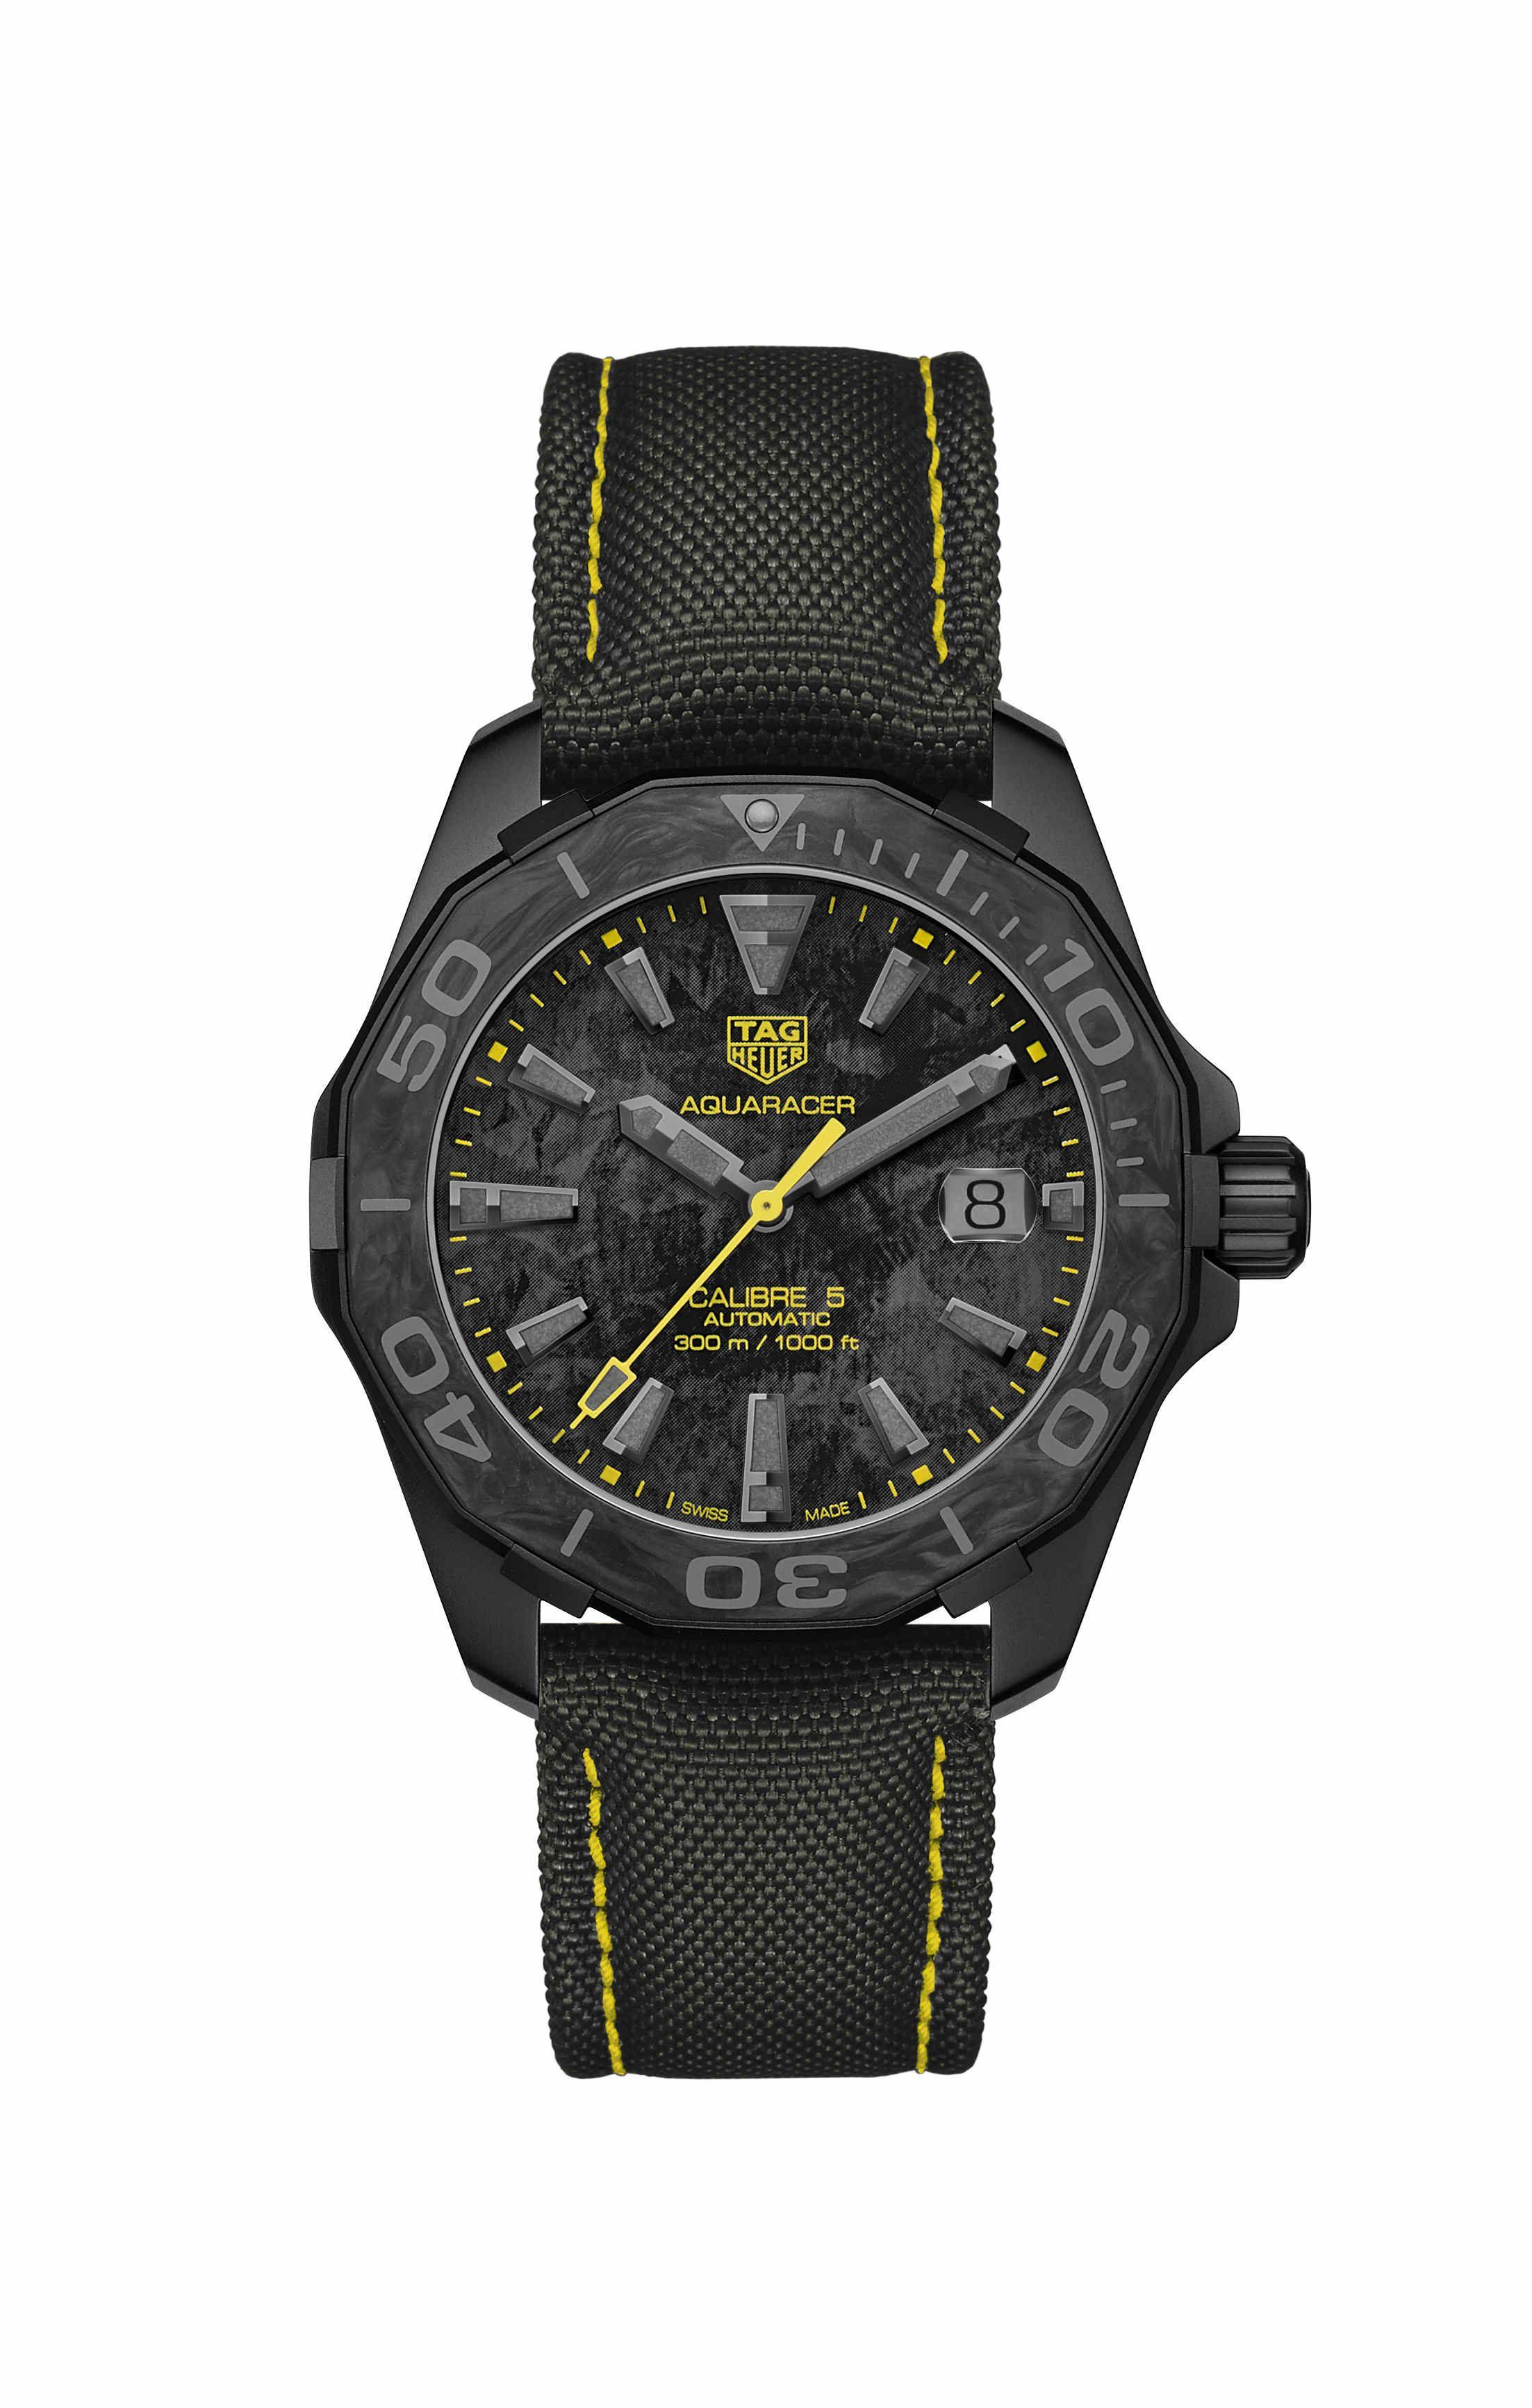 TAG Heuer泰格豪雅荣推碳纤维特别款腕表 仅在精品店以及官网发售